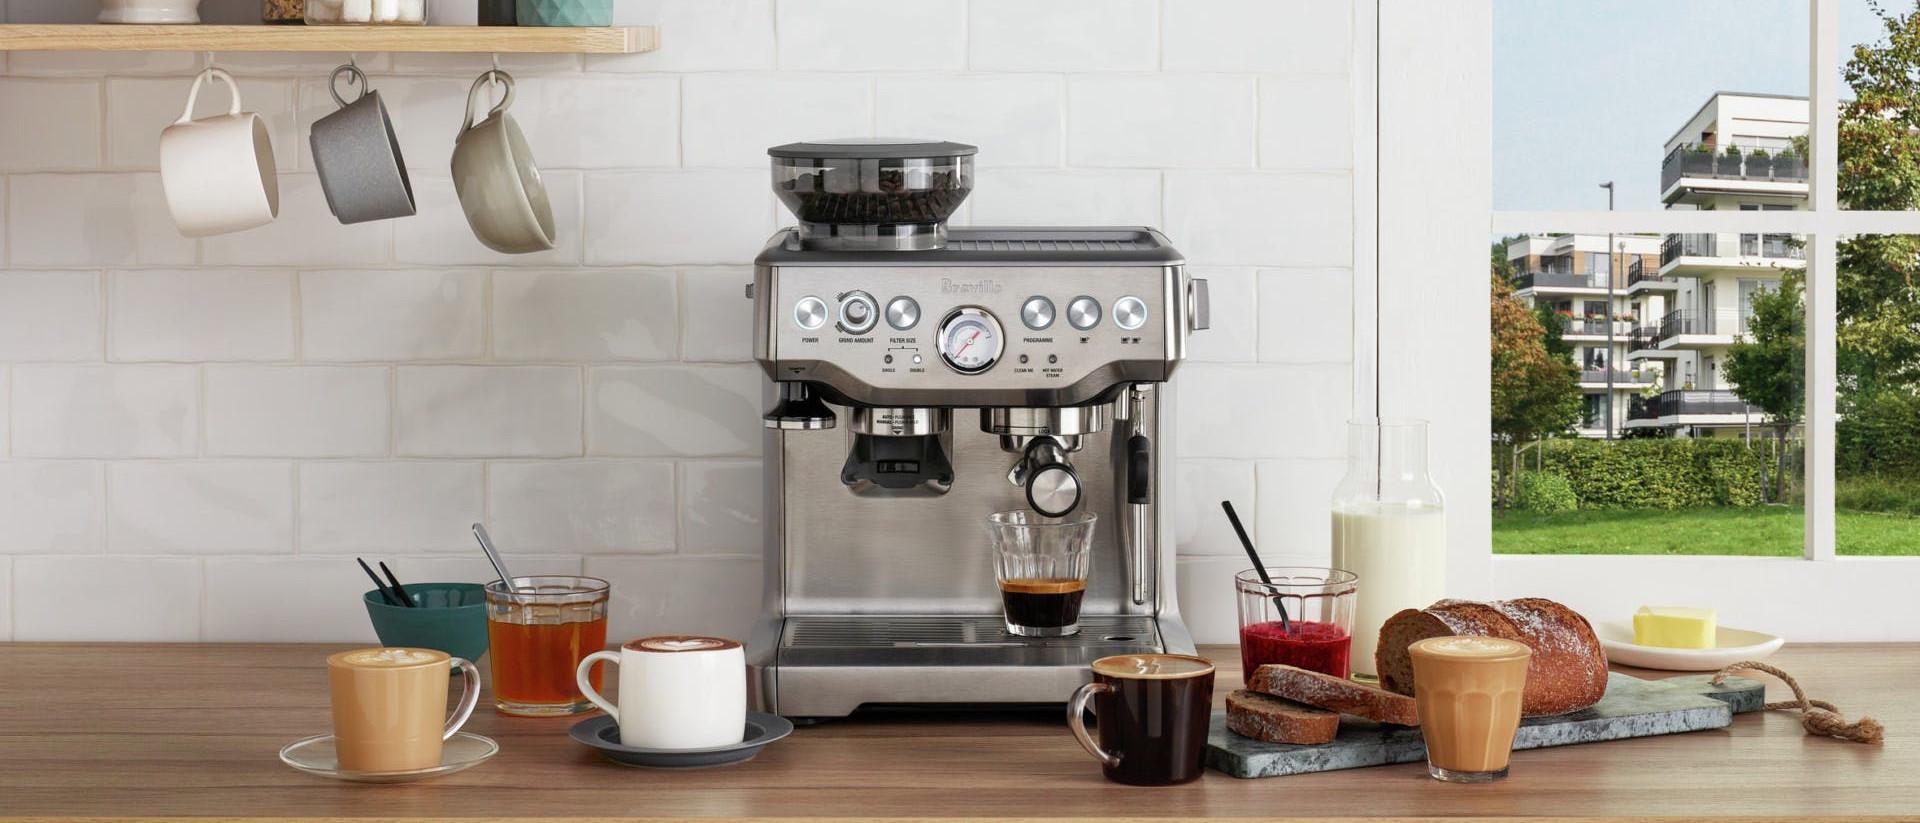 Best coffee machines in Australia: The top home espresso machines in 2020 | TechRadar